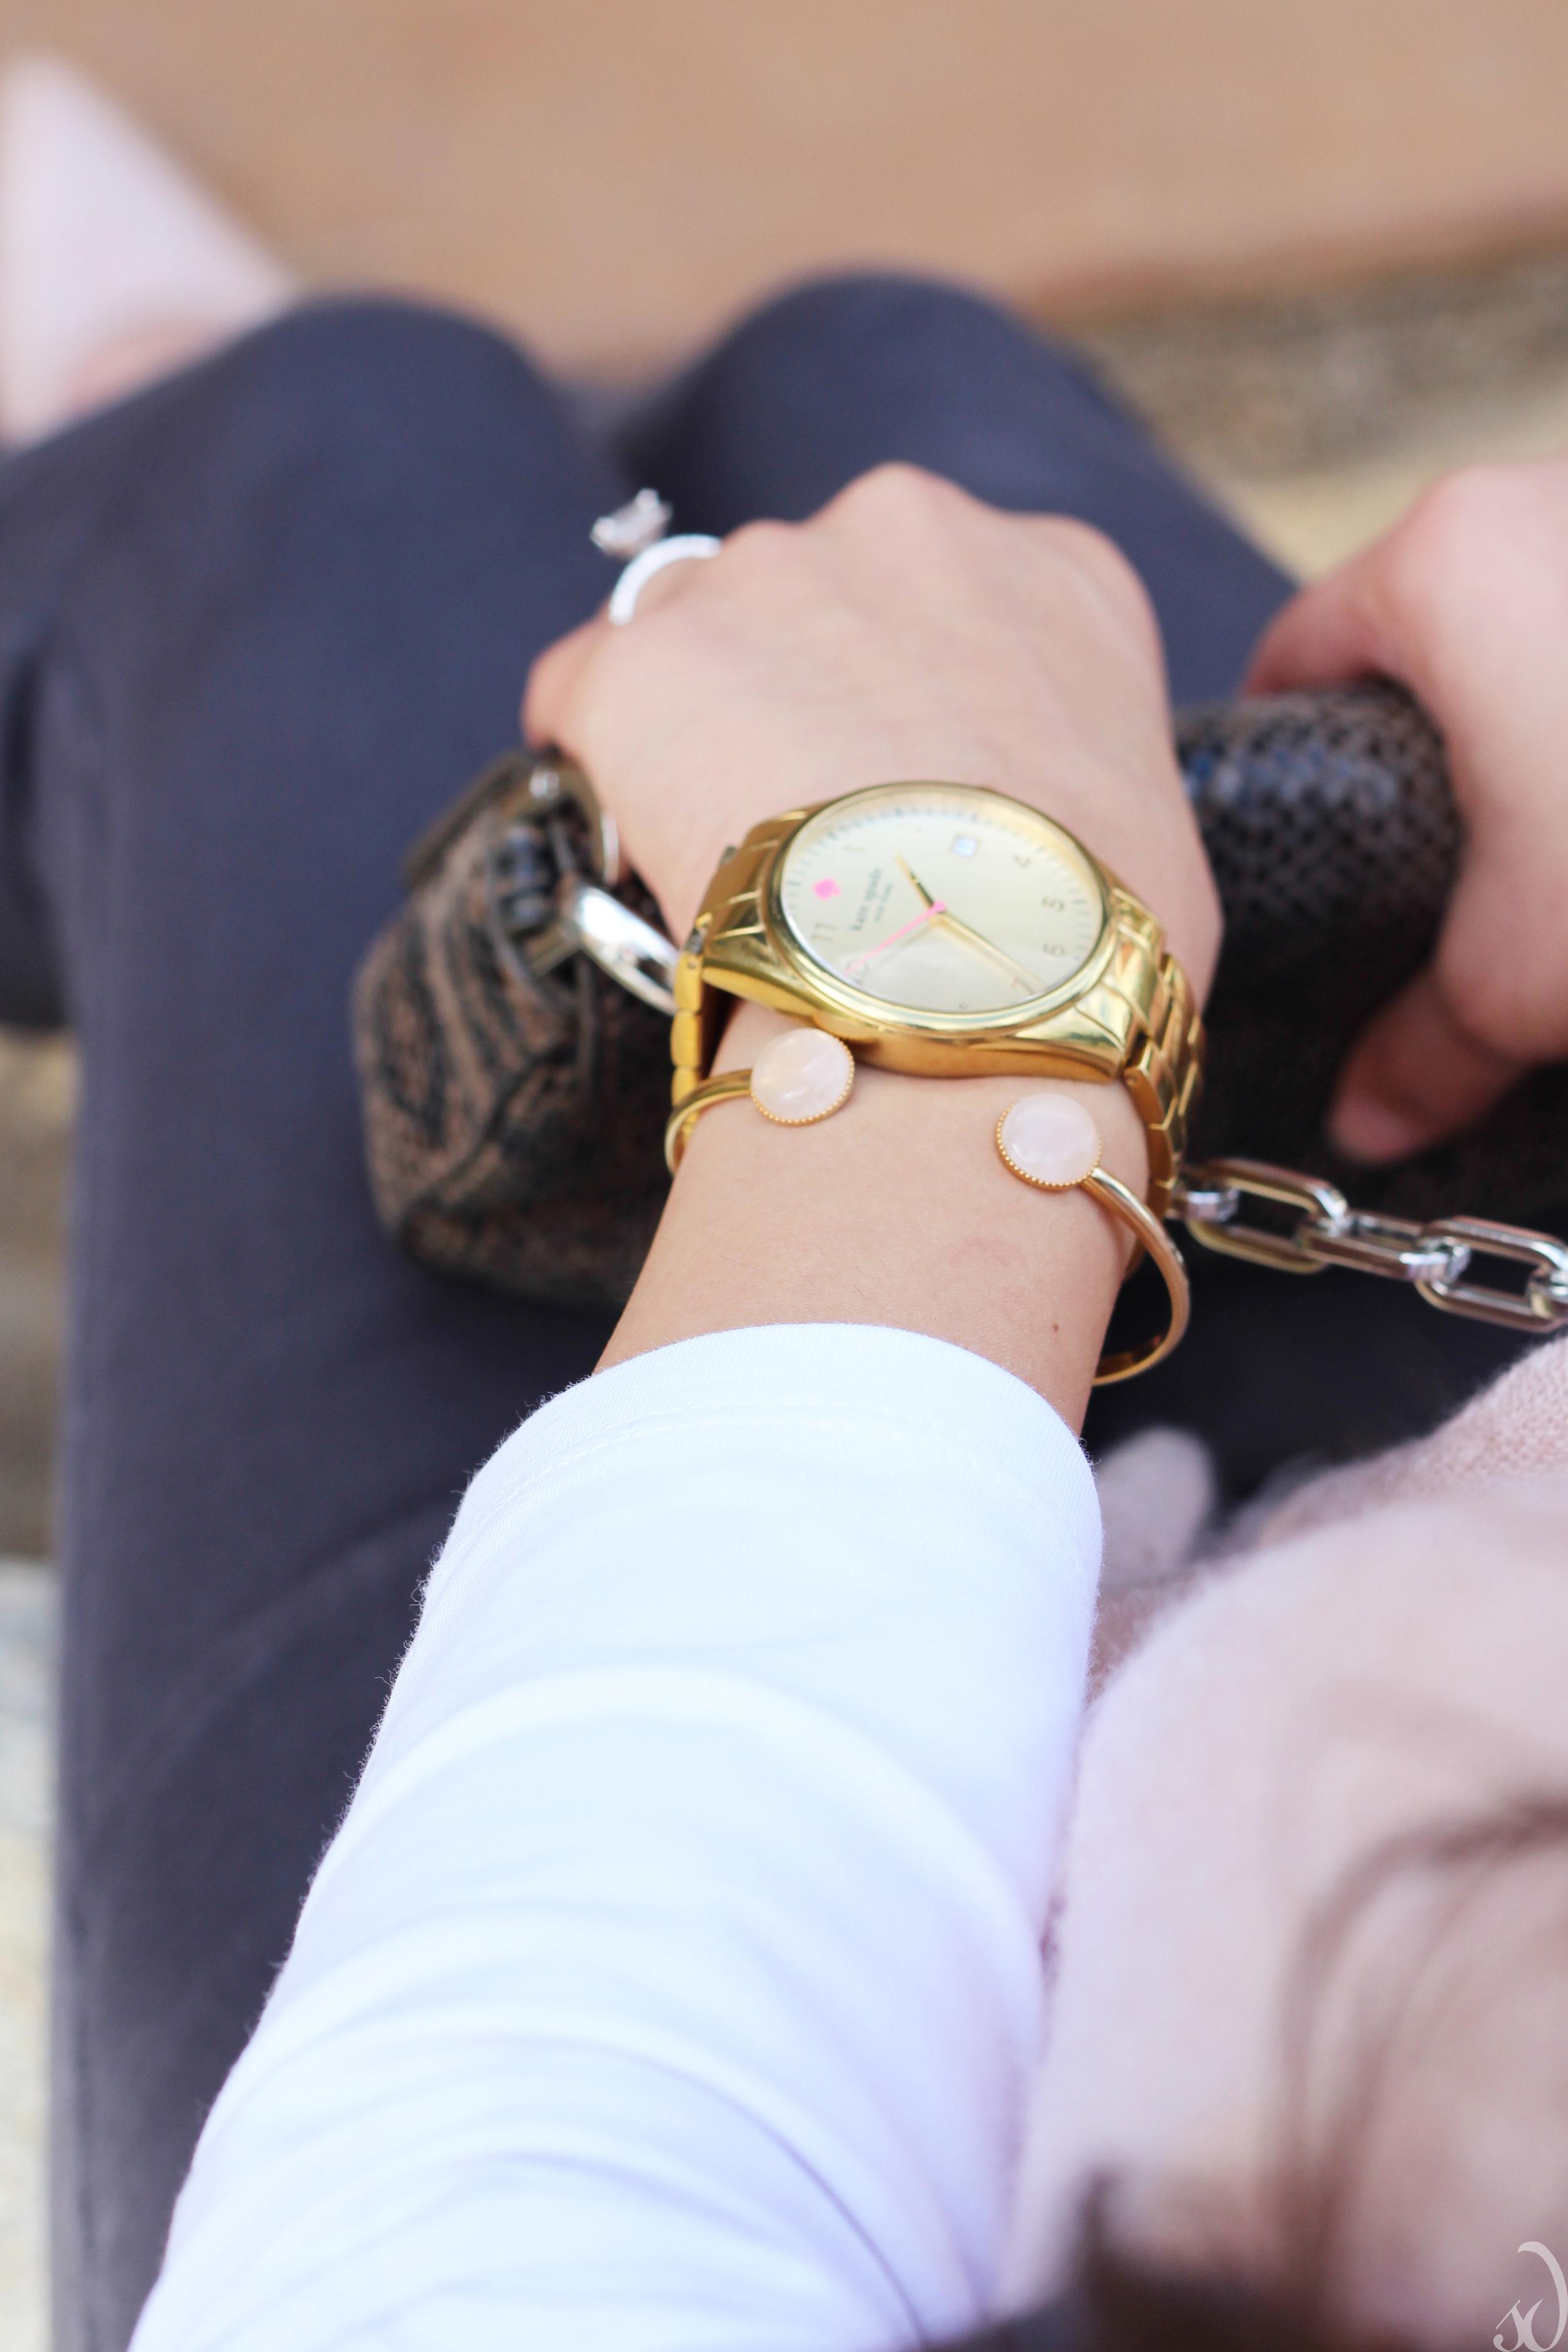 blush cuff, gold watch, kate spade, the dot, jewelry, accessories